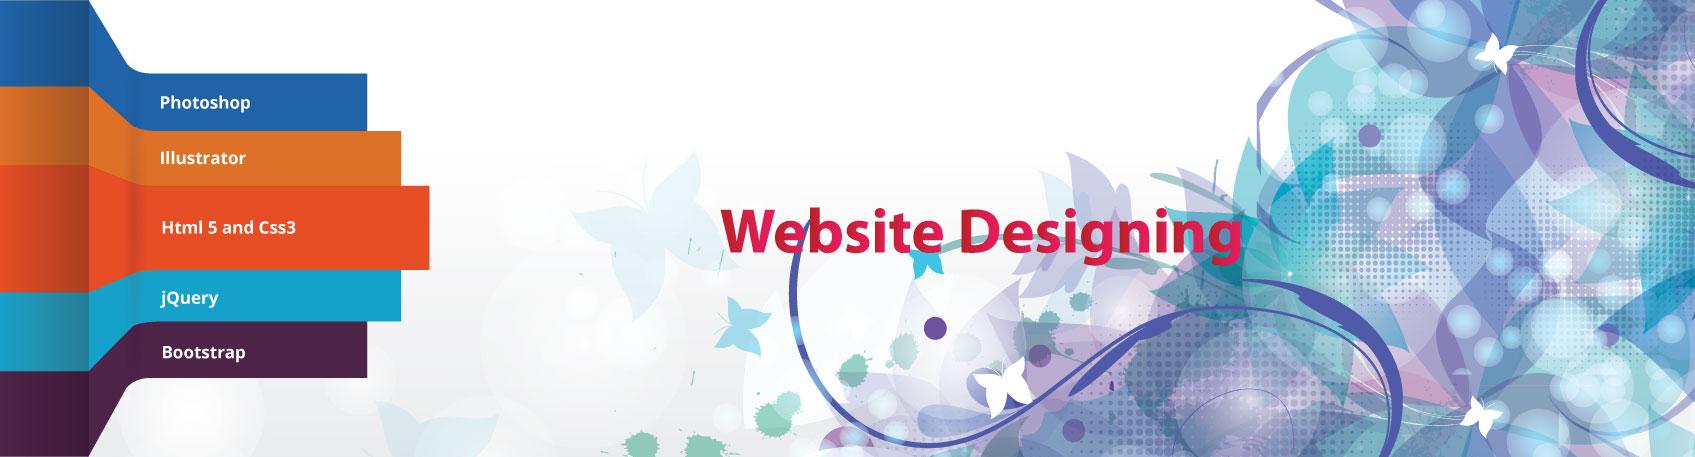 webdesiging-banner